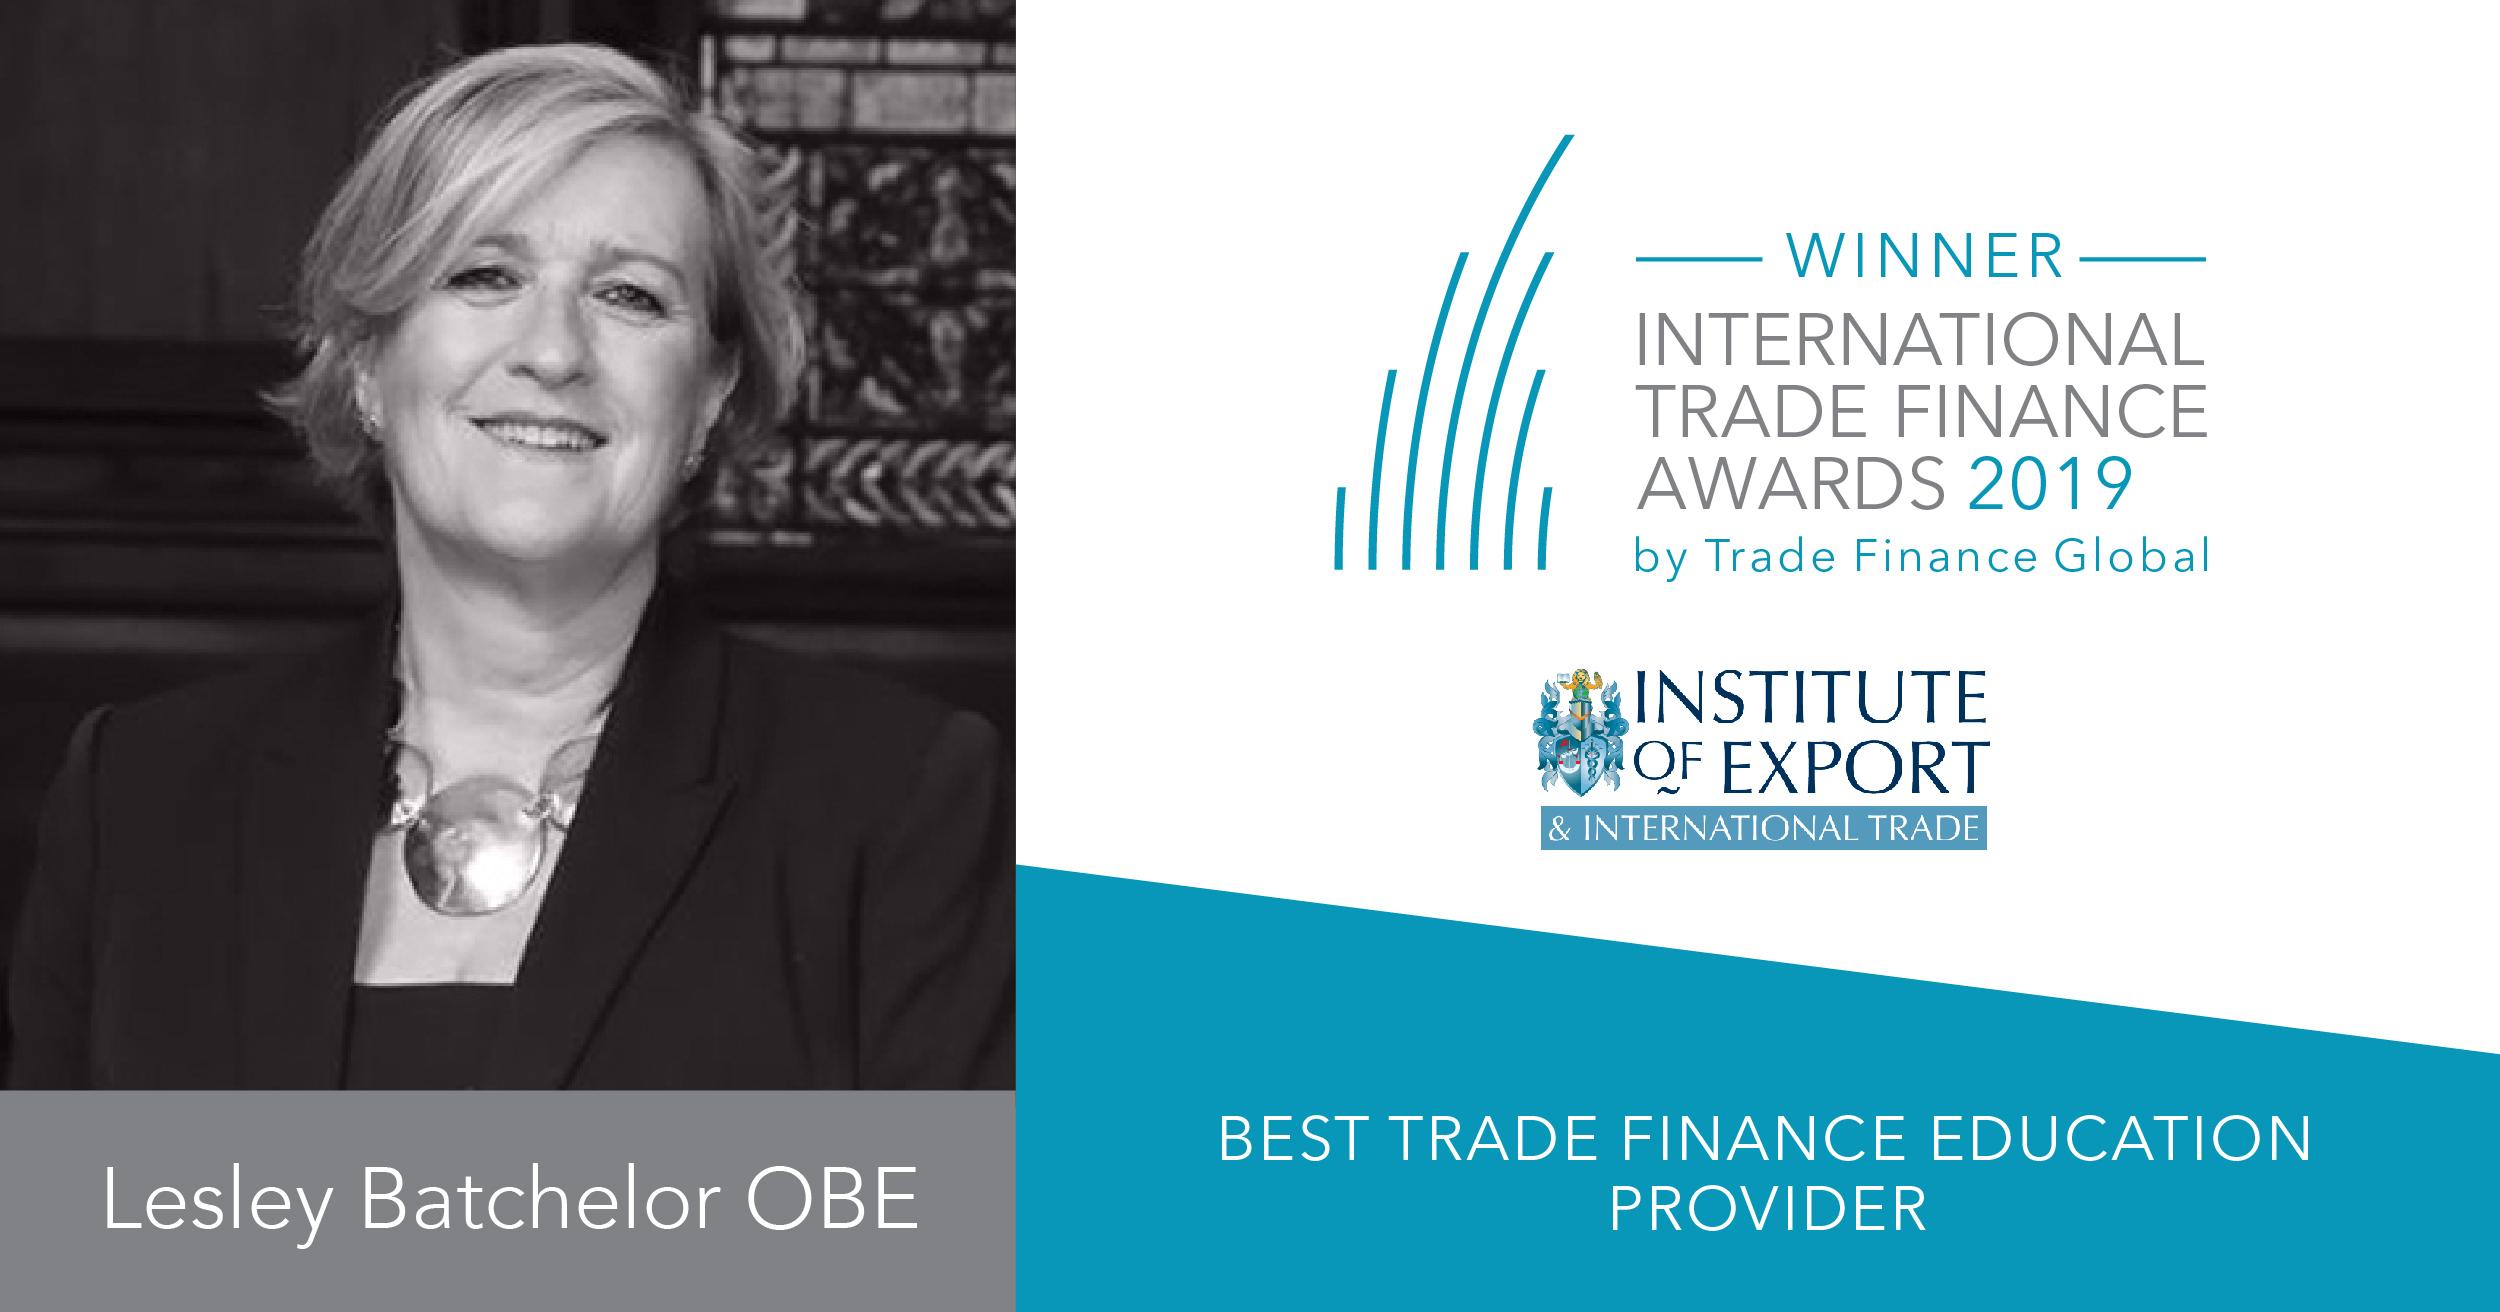 tfg award winner - institute of export